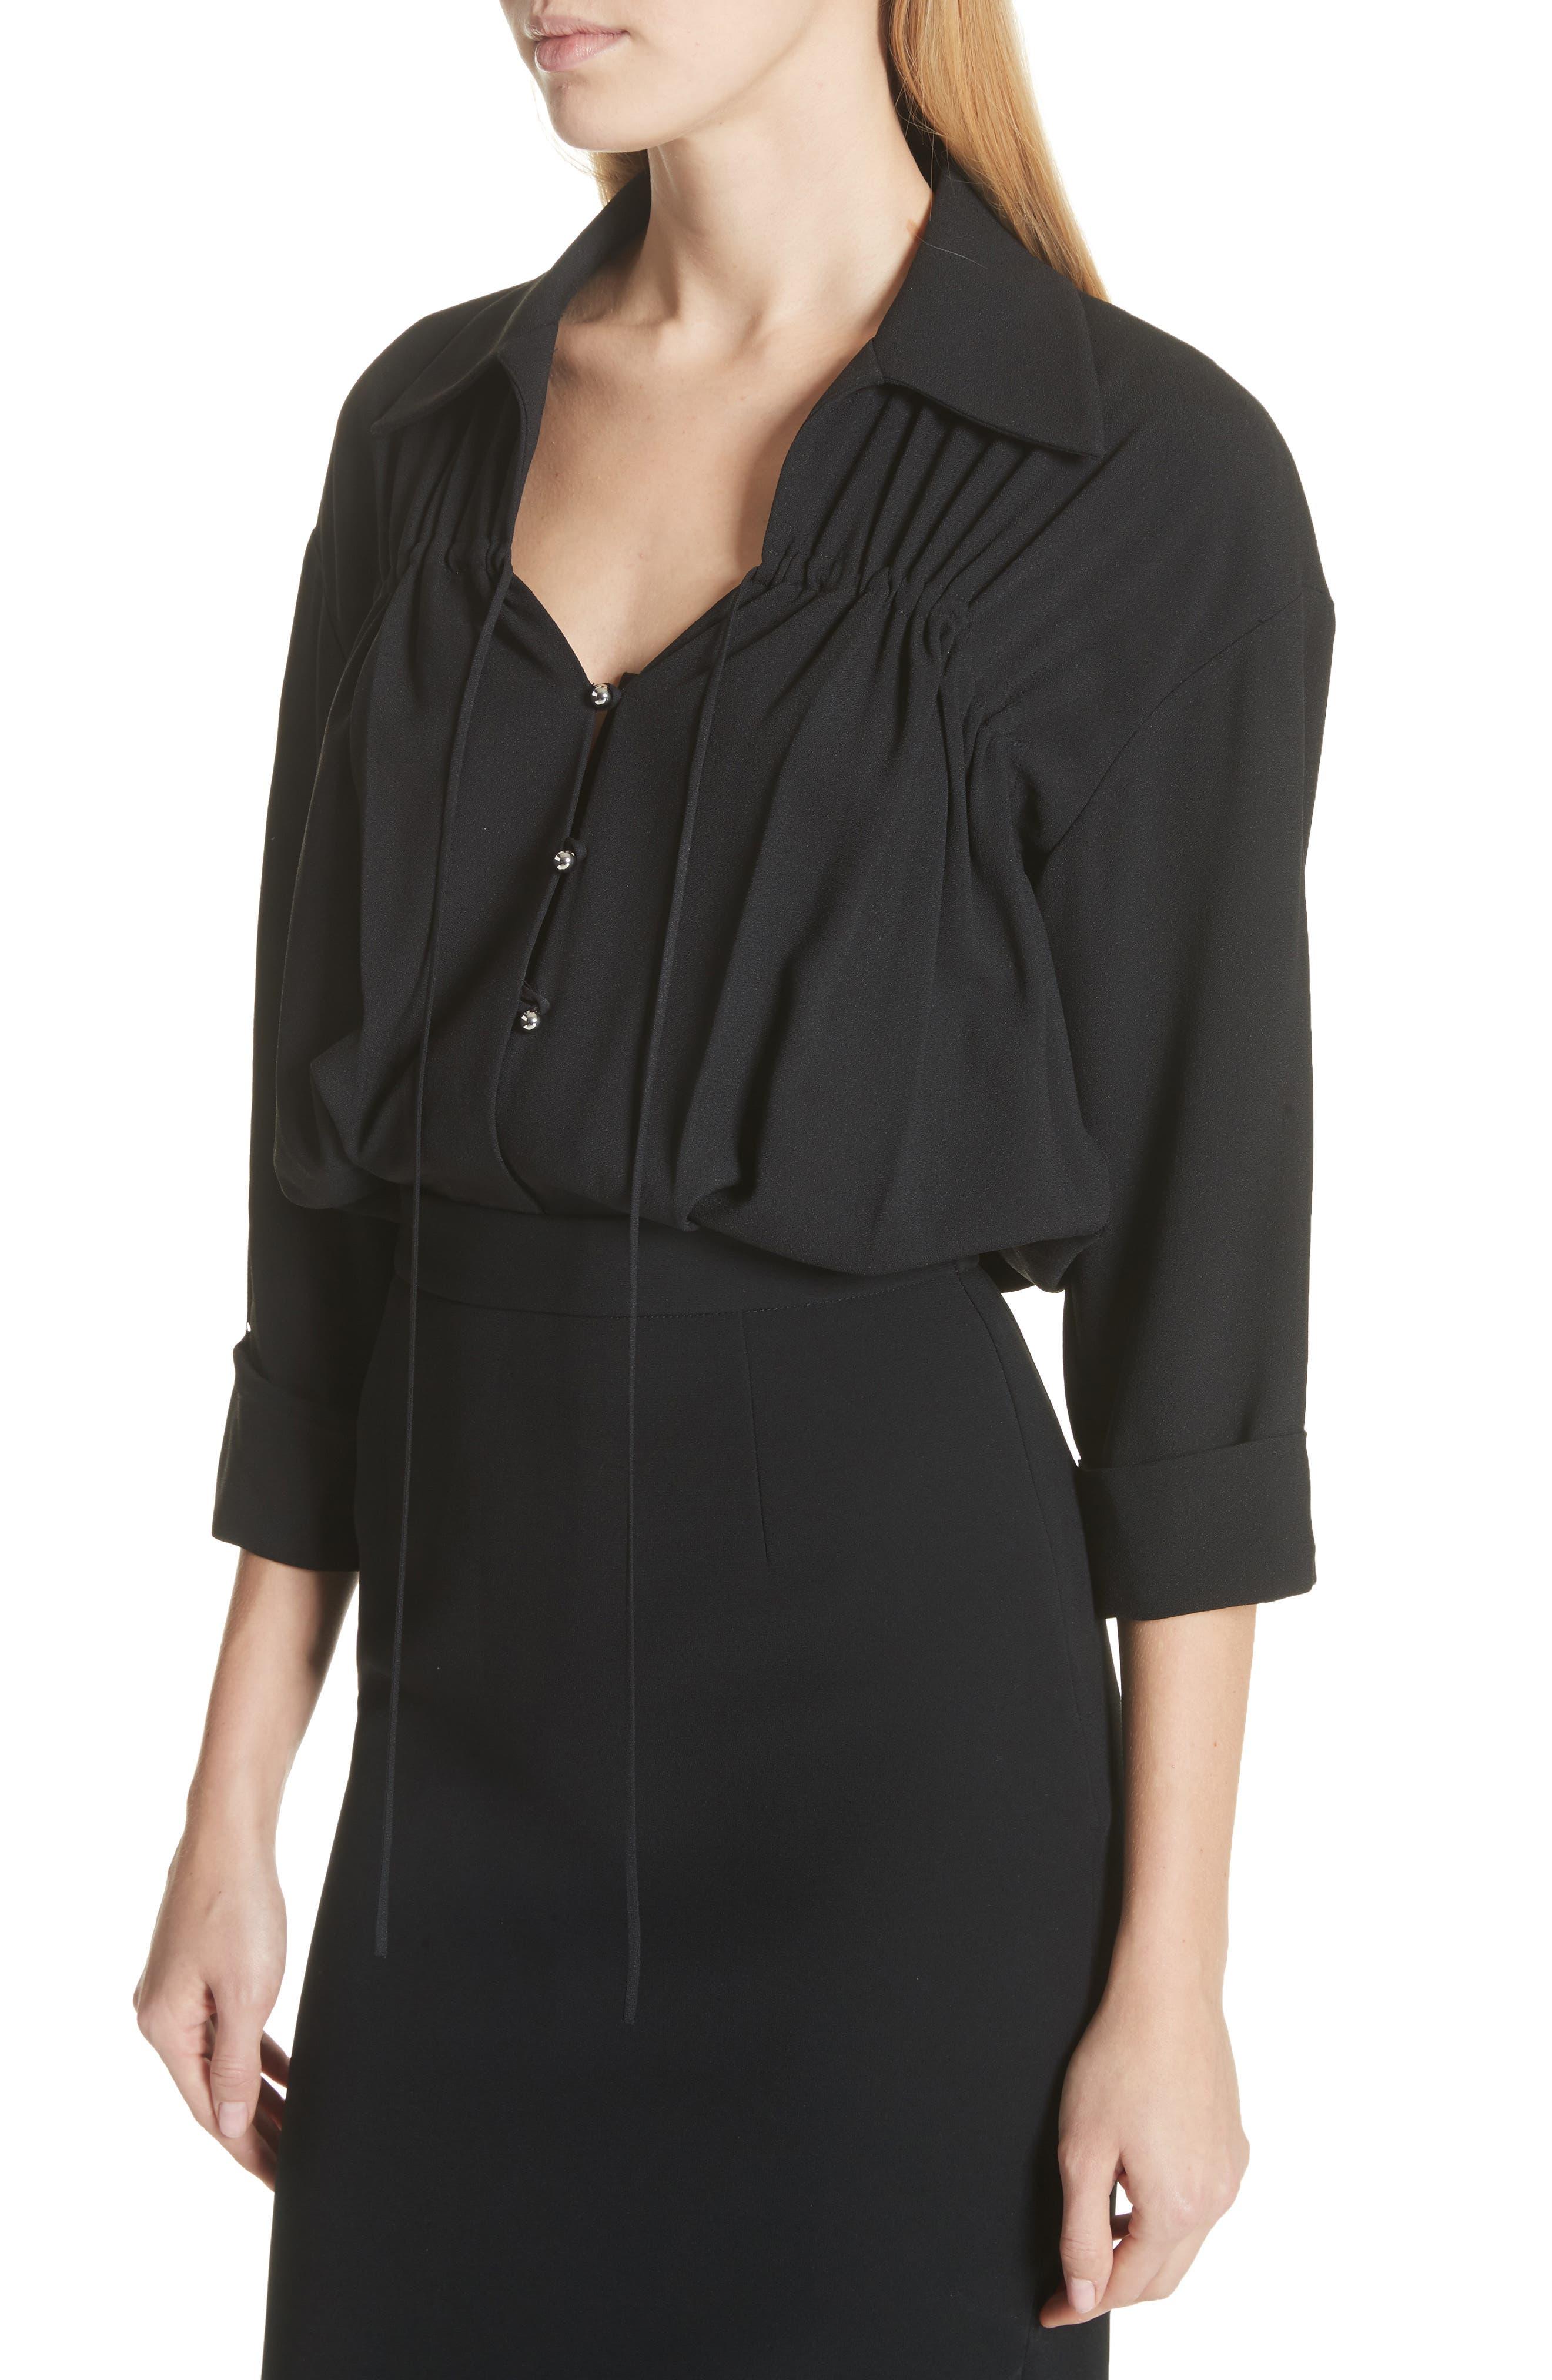 Ruched Blouson Dress,                             Alternate thumbnail 4, color,                             Black